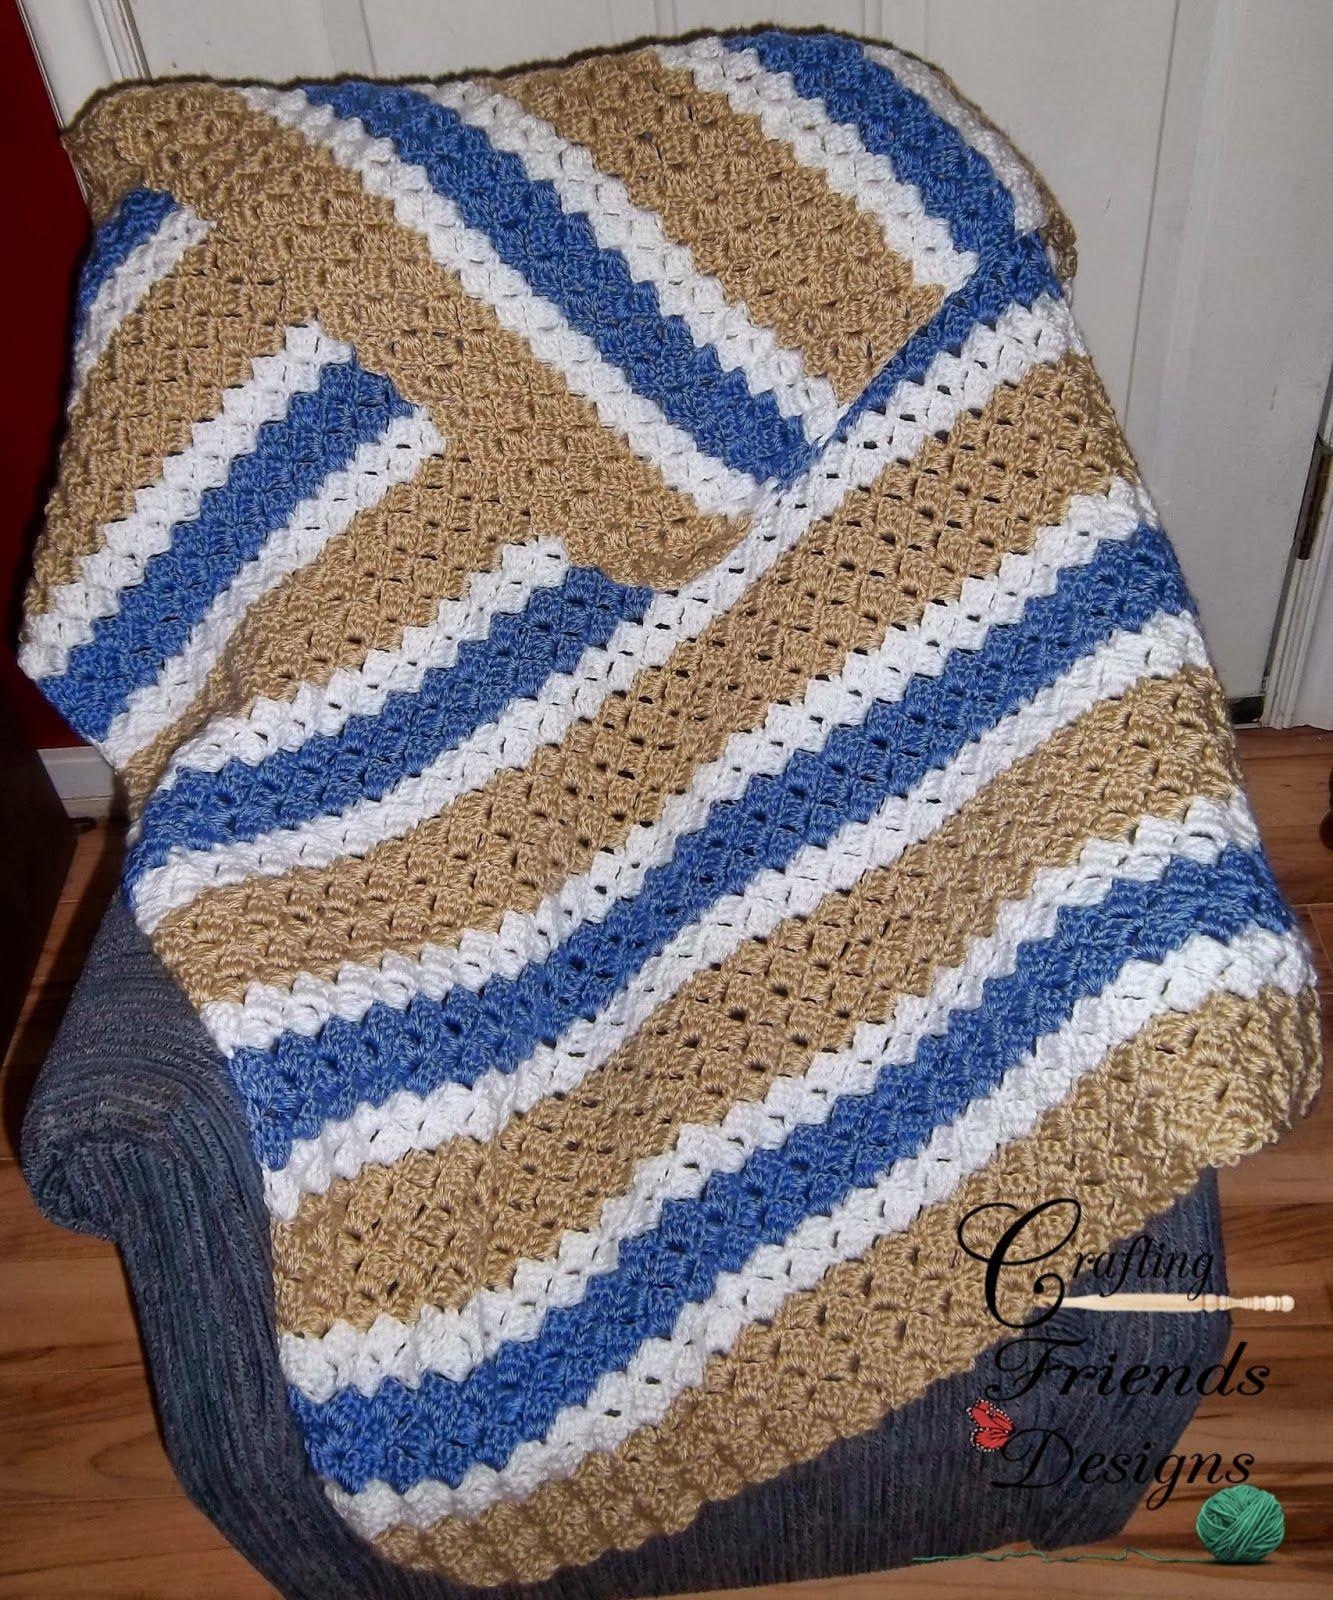 Free Crochet Pattern: Crafting Friends Designs: Brick Stitch Afghan ...